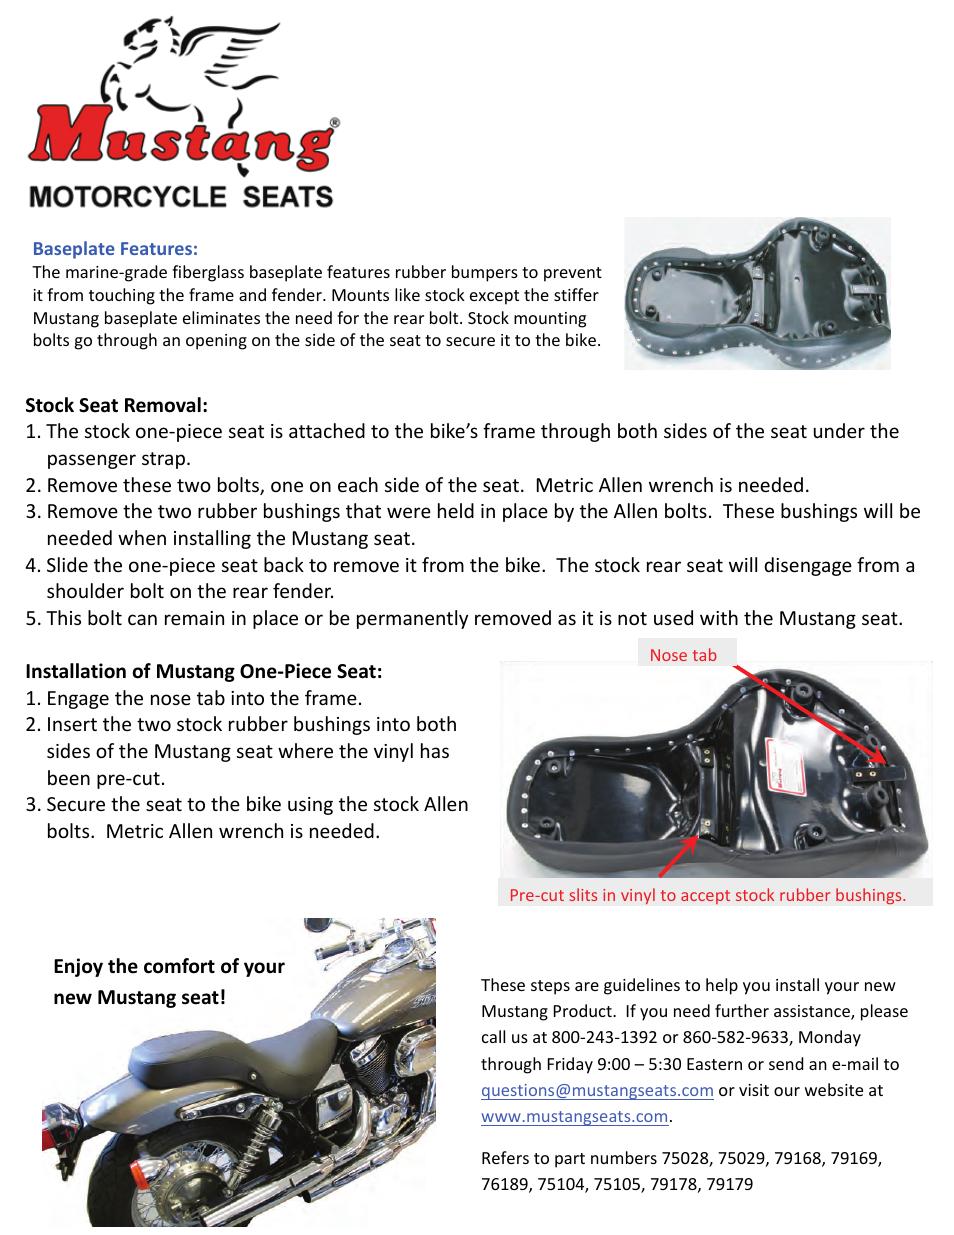 Mustang Motorcycle Seats One-Piece DayTripper - Honda VT750 Spirit & VT750DC  User Manual | 1 page